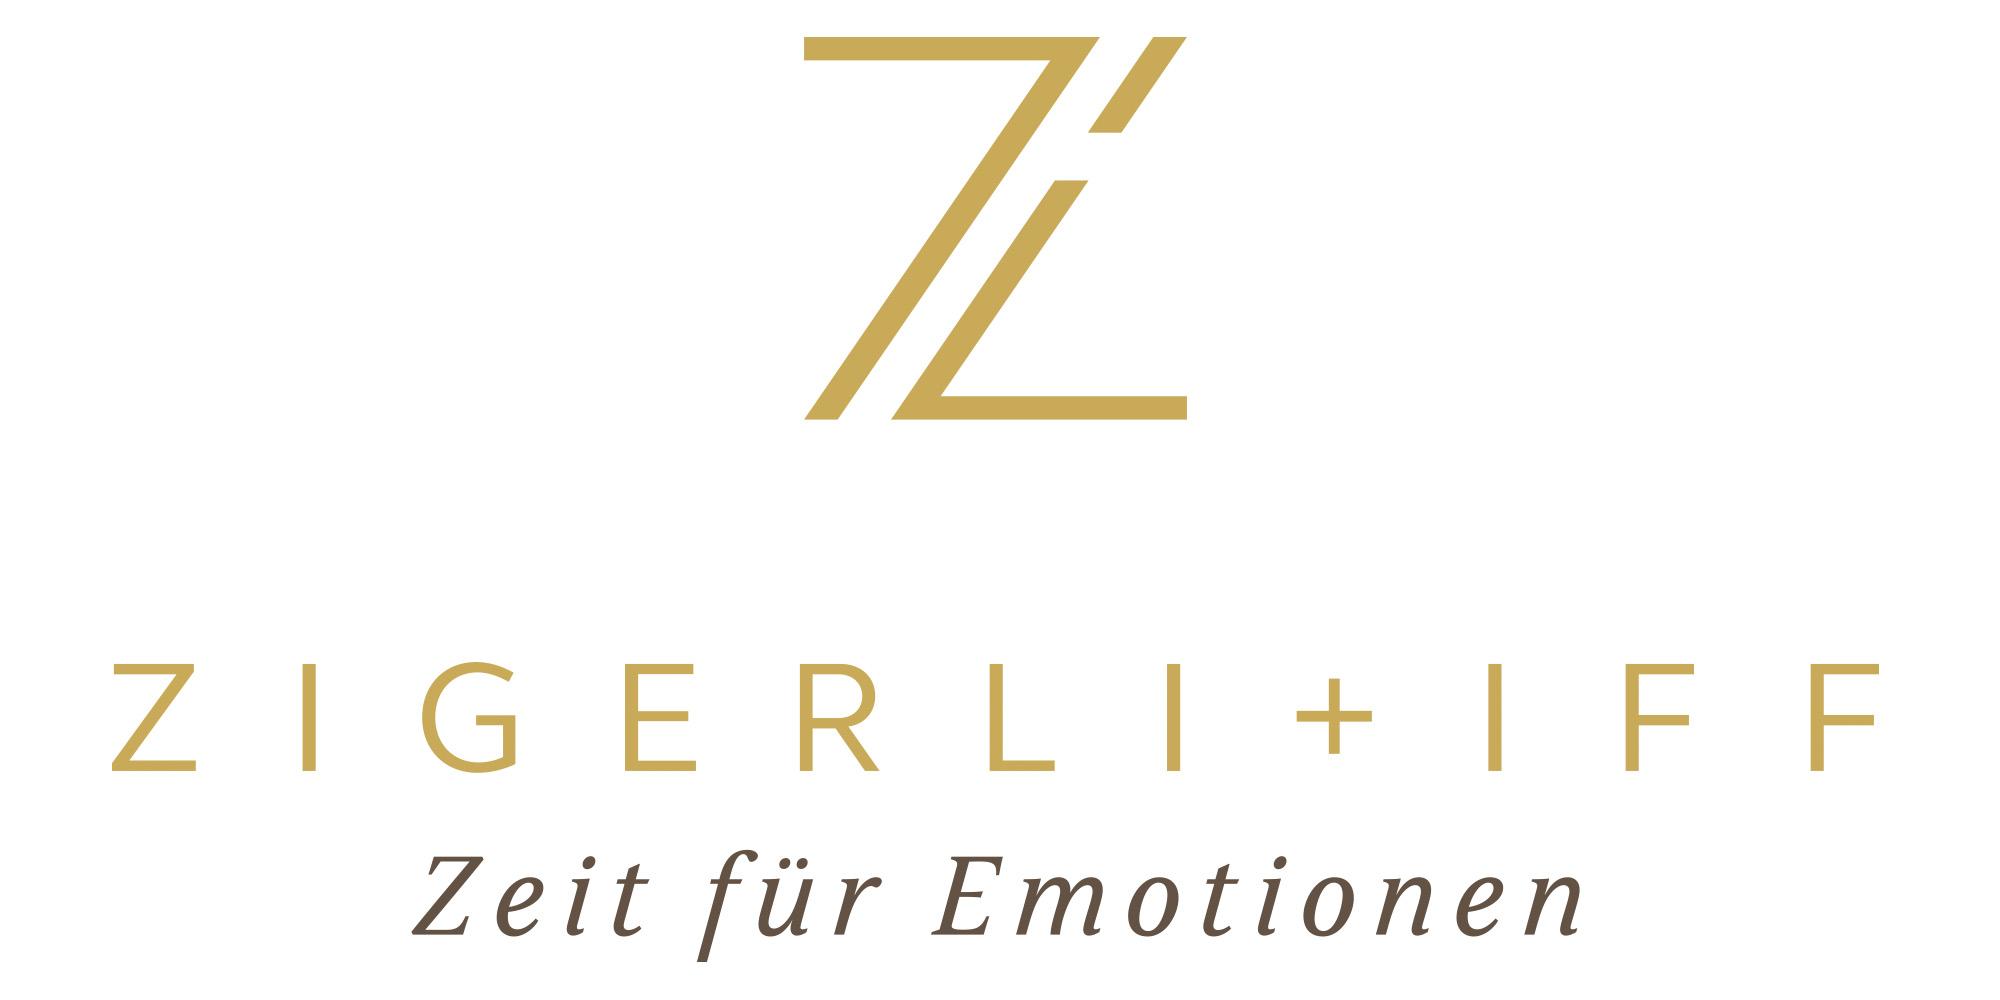 Zigerli+Iff